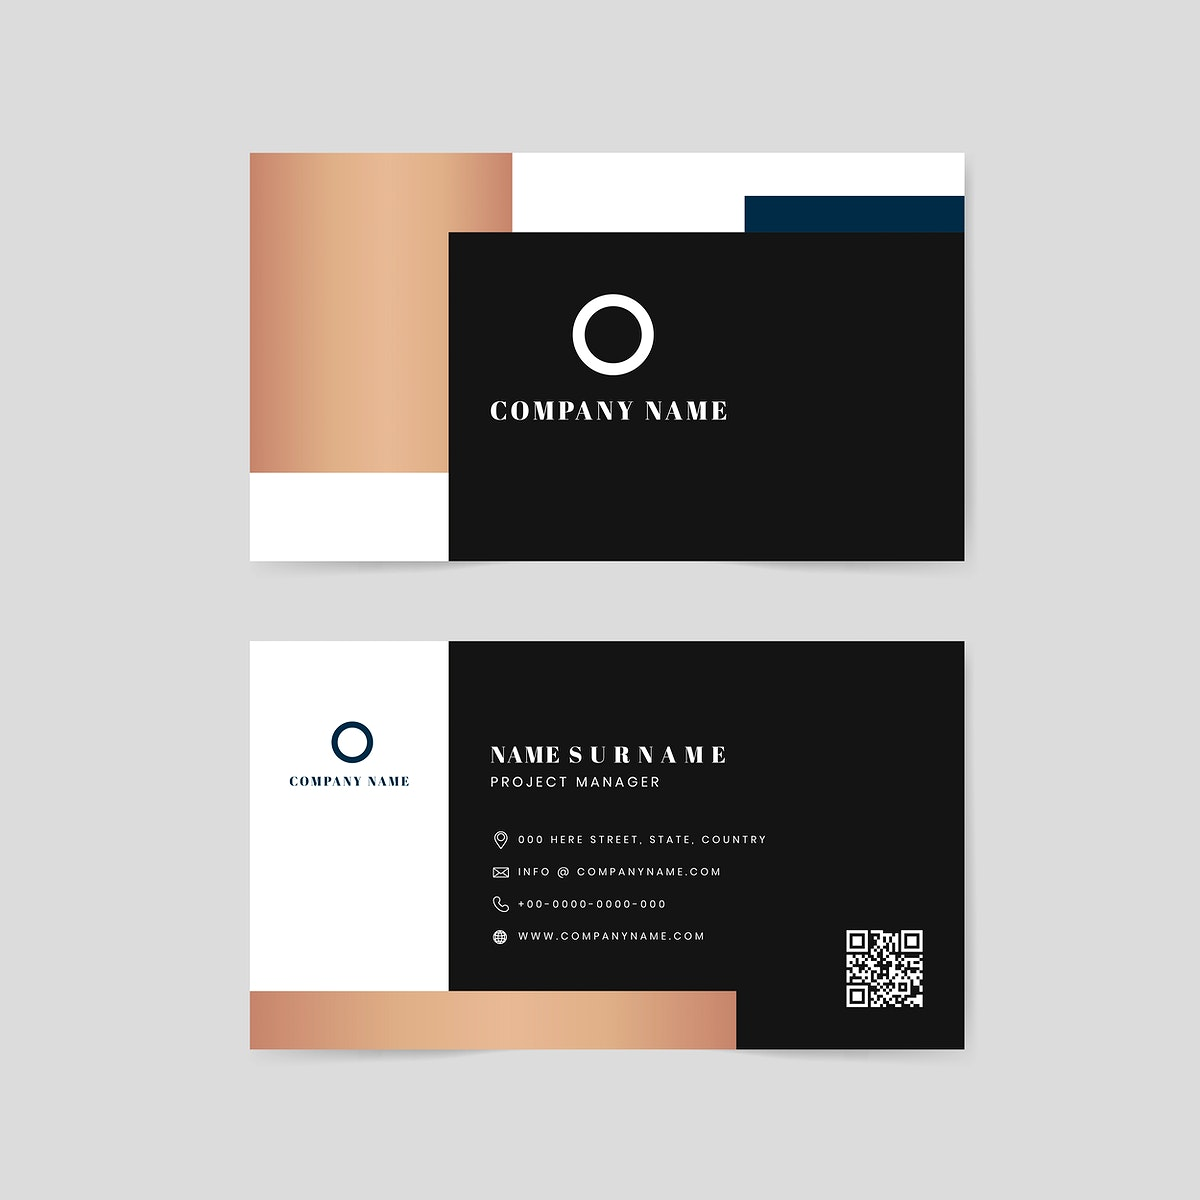 Corporate name card design vector